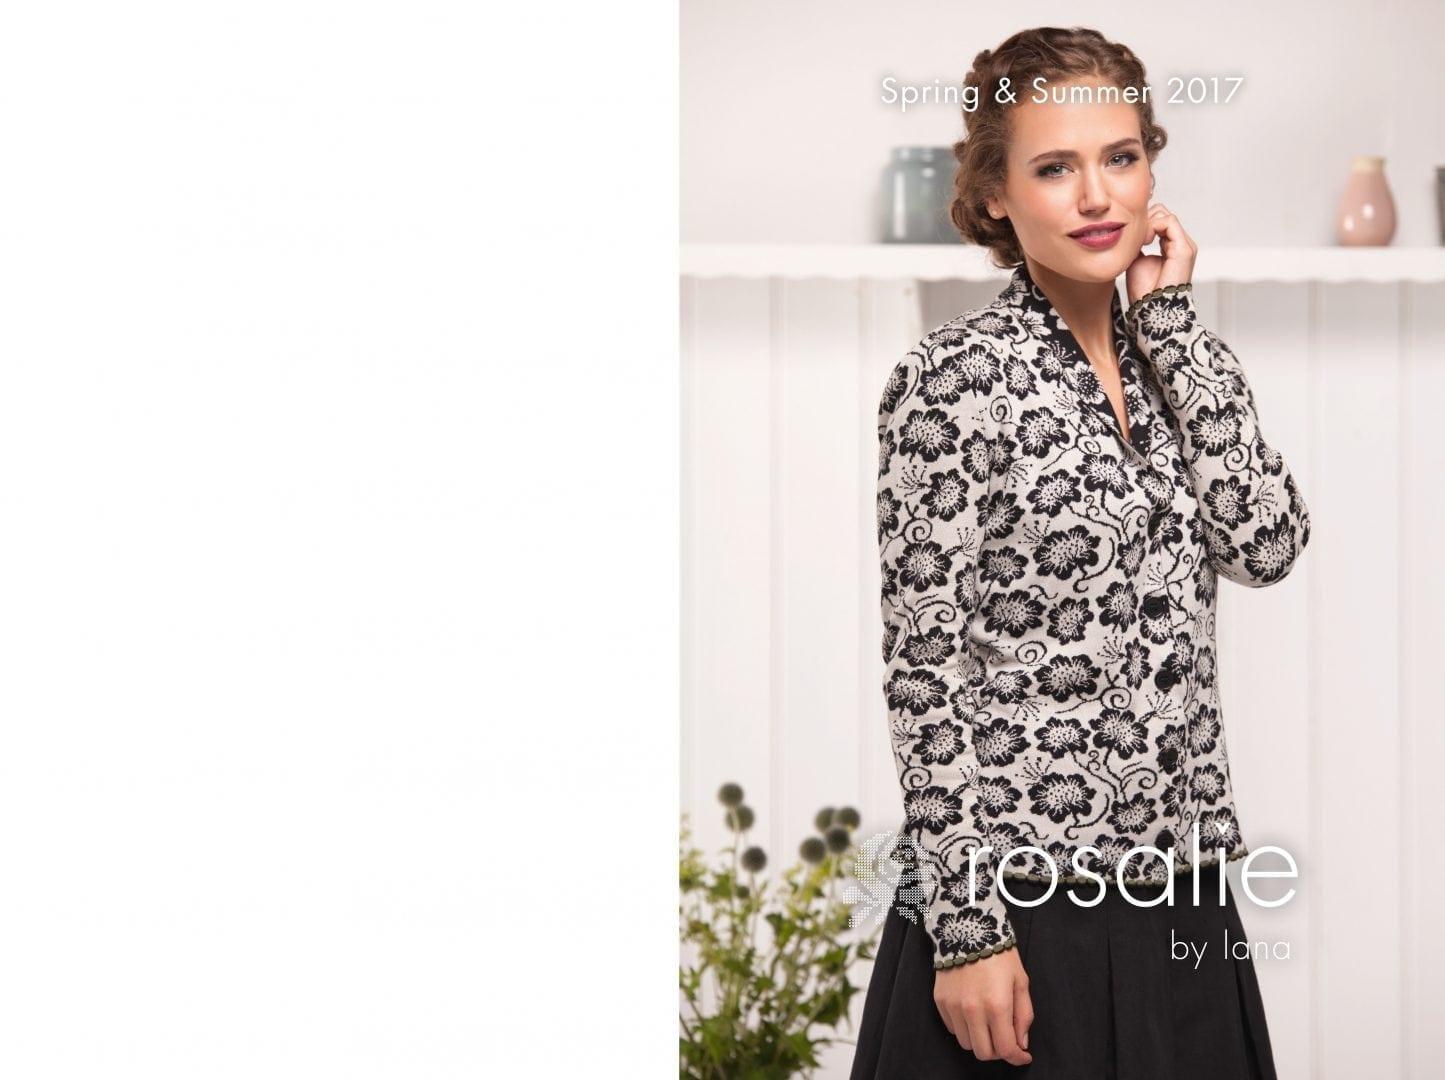 Rosalie_Katalog_SS_2017_195x275mm_hr-1